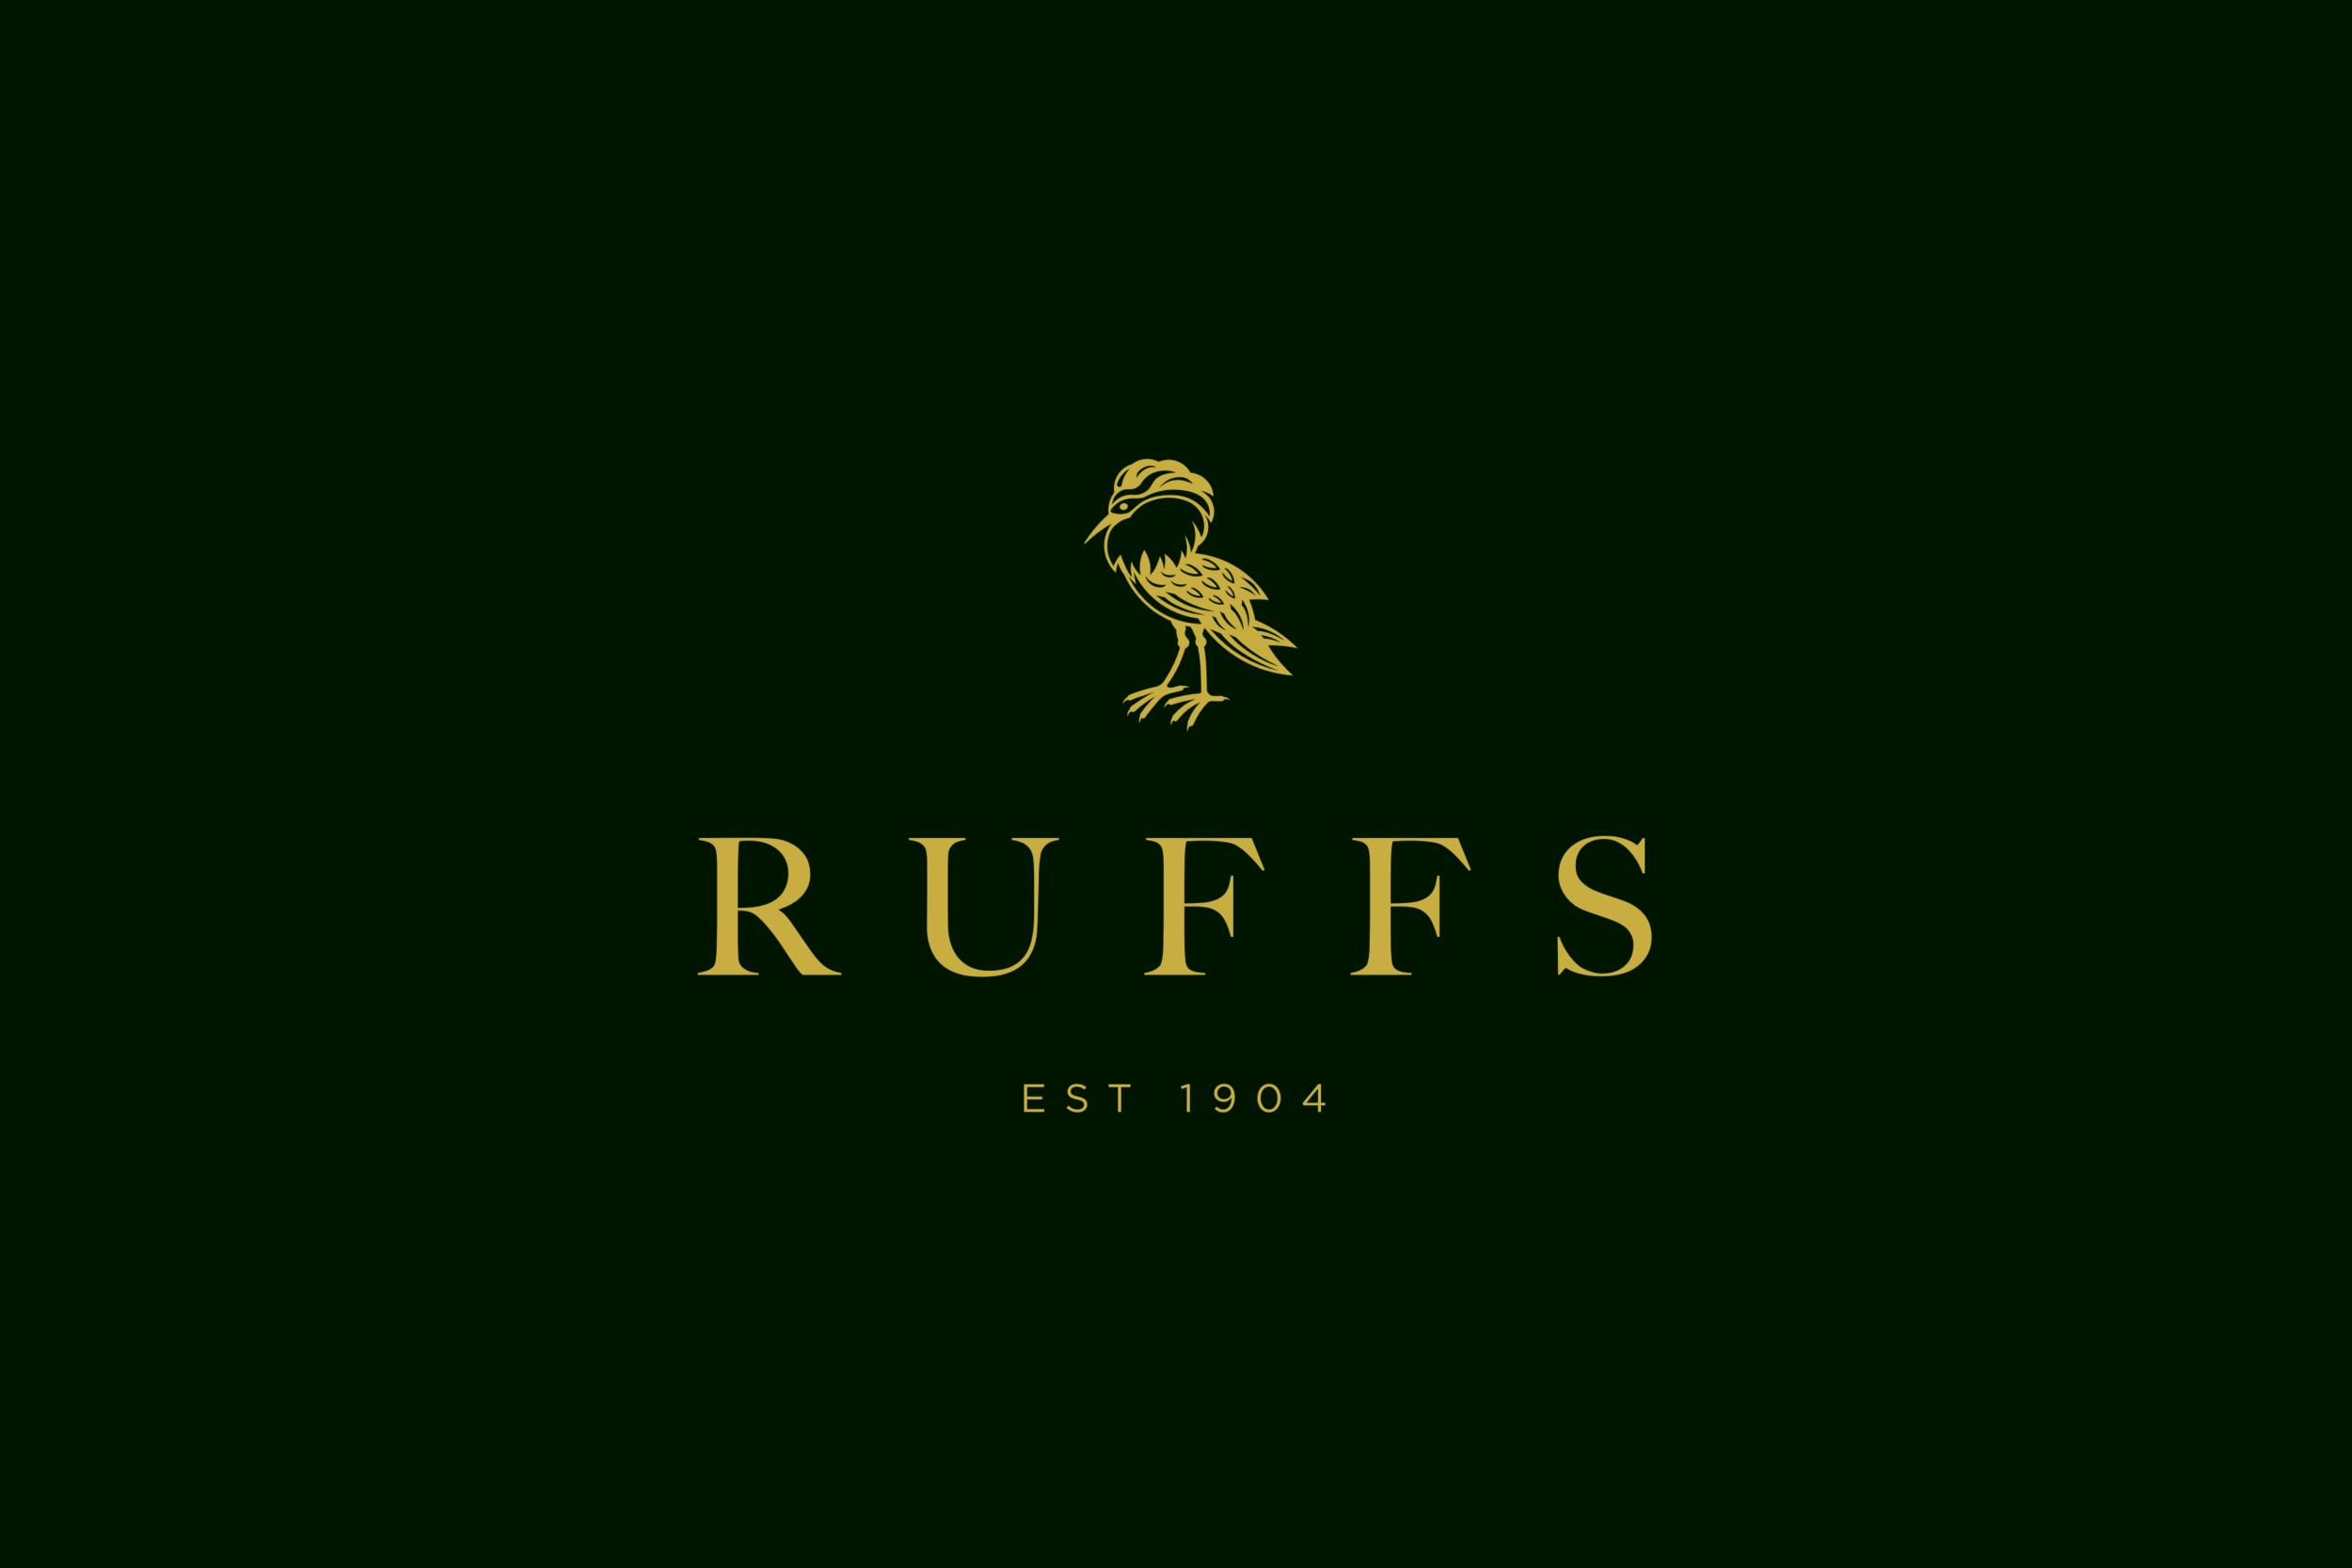 Ruffs 1.png